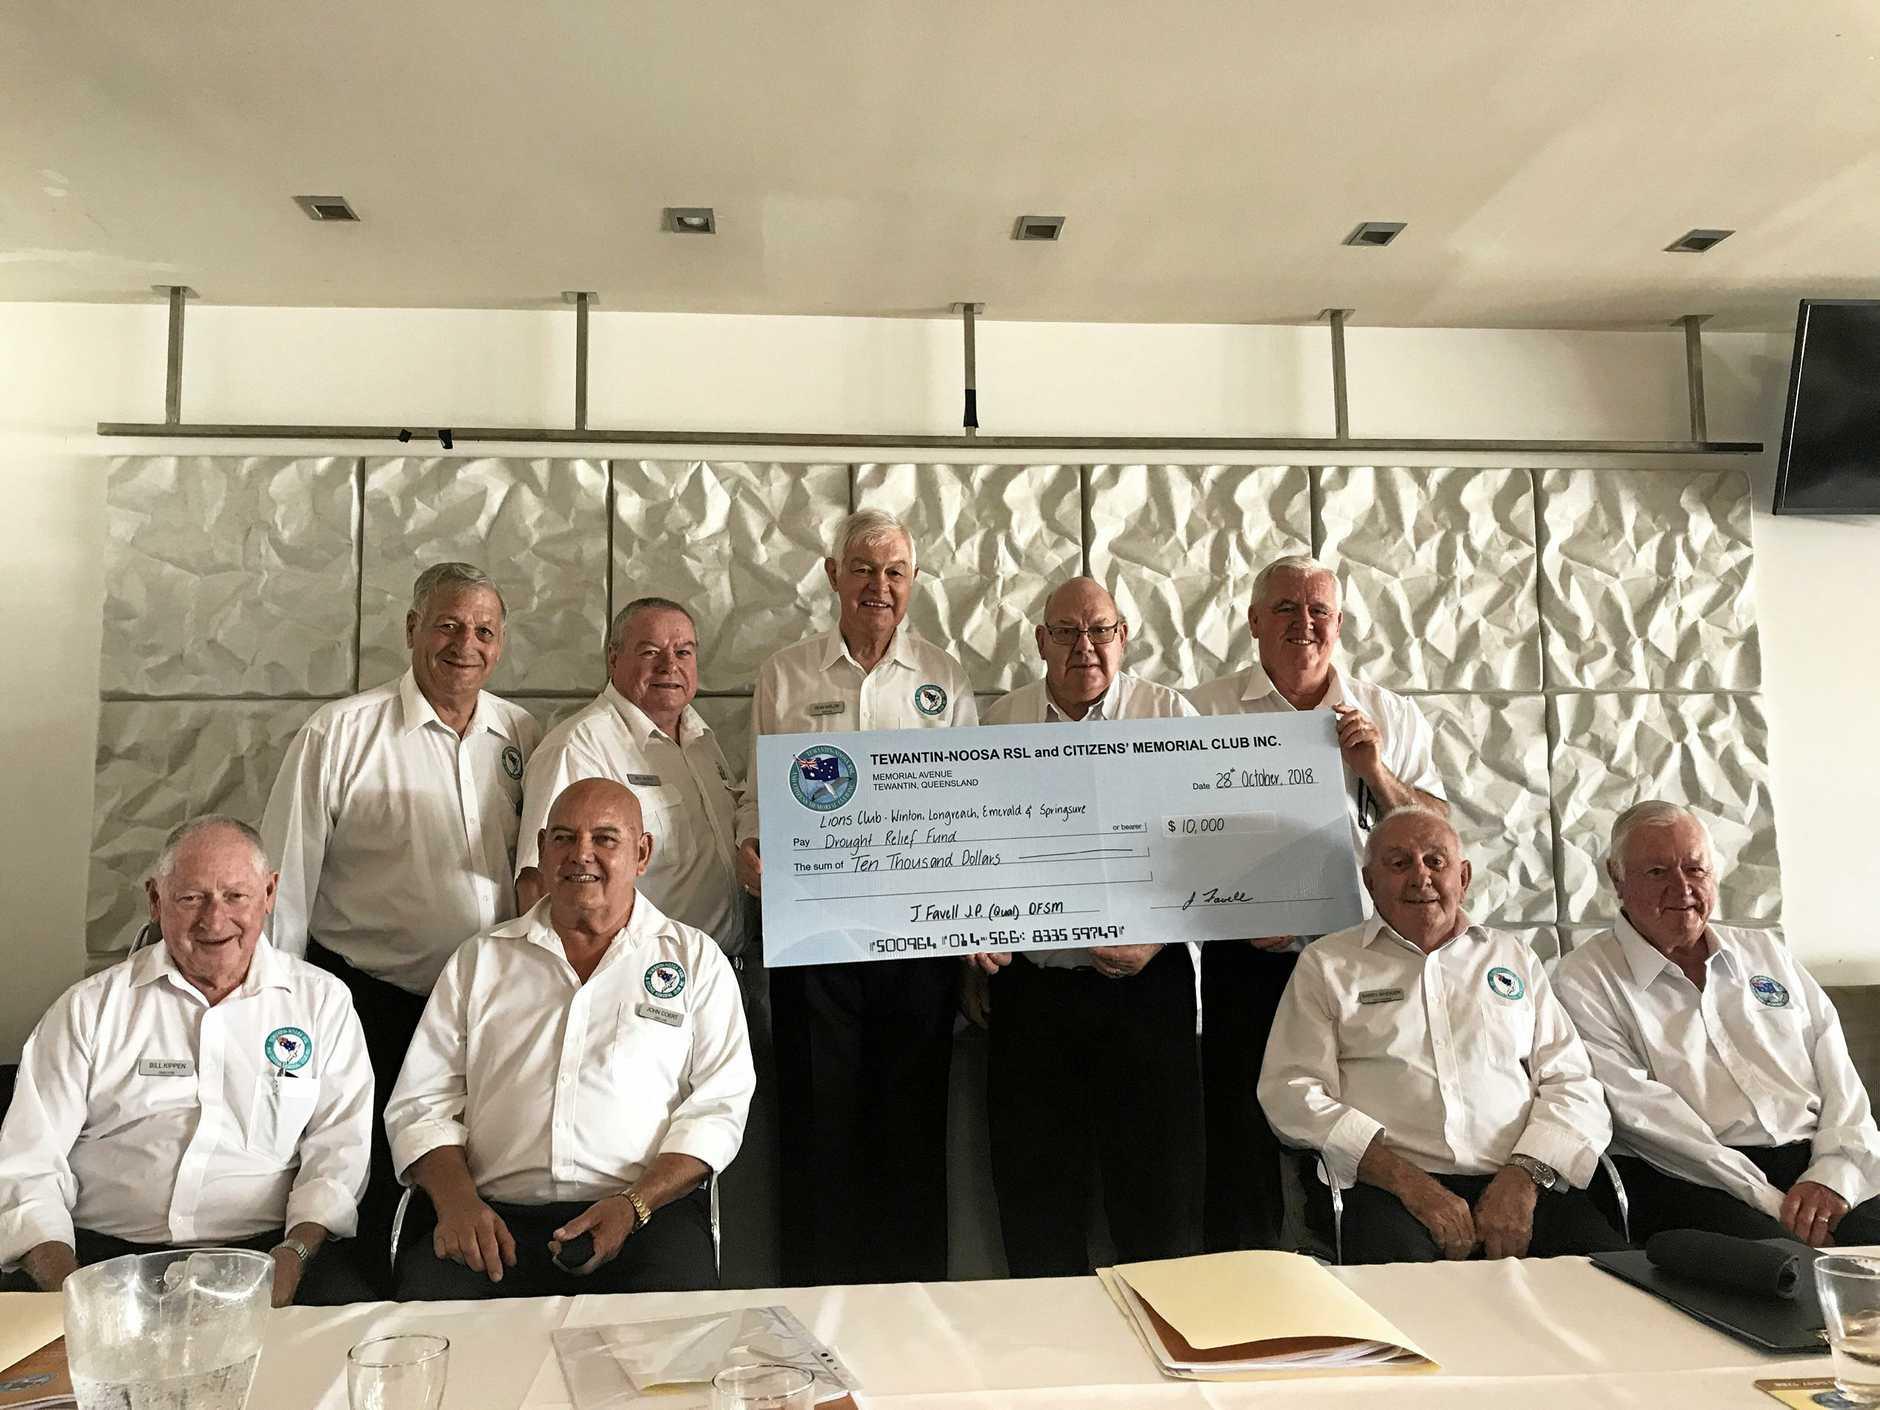 MAJOR BOOST: Tewantin Noosa RSL board announced a $10,000 donation for drought aid.